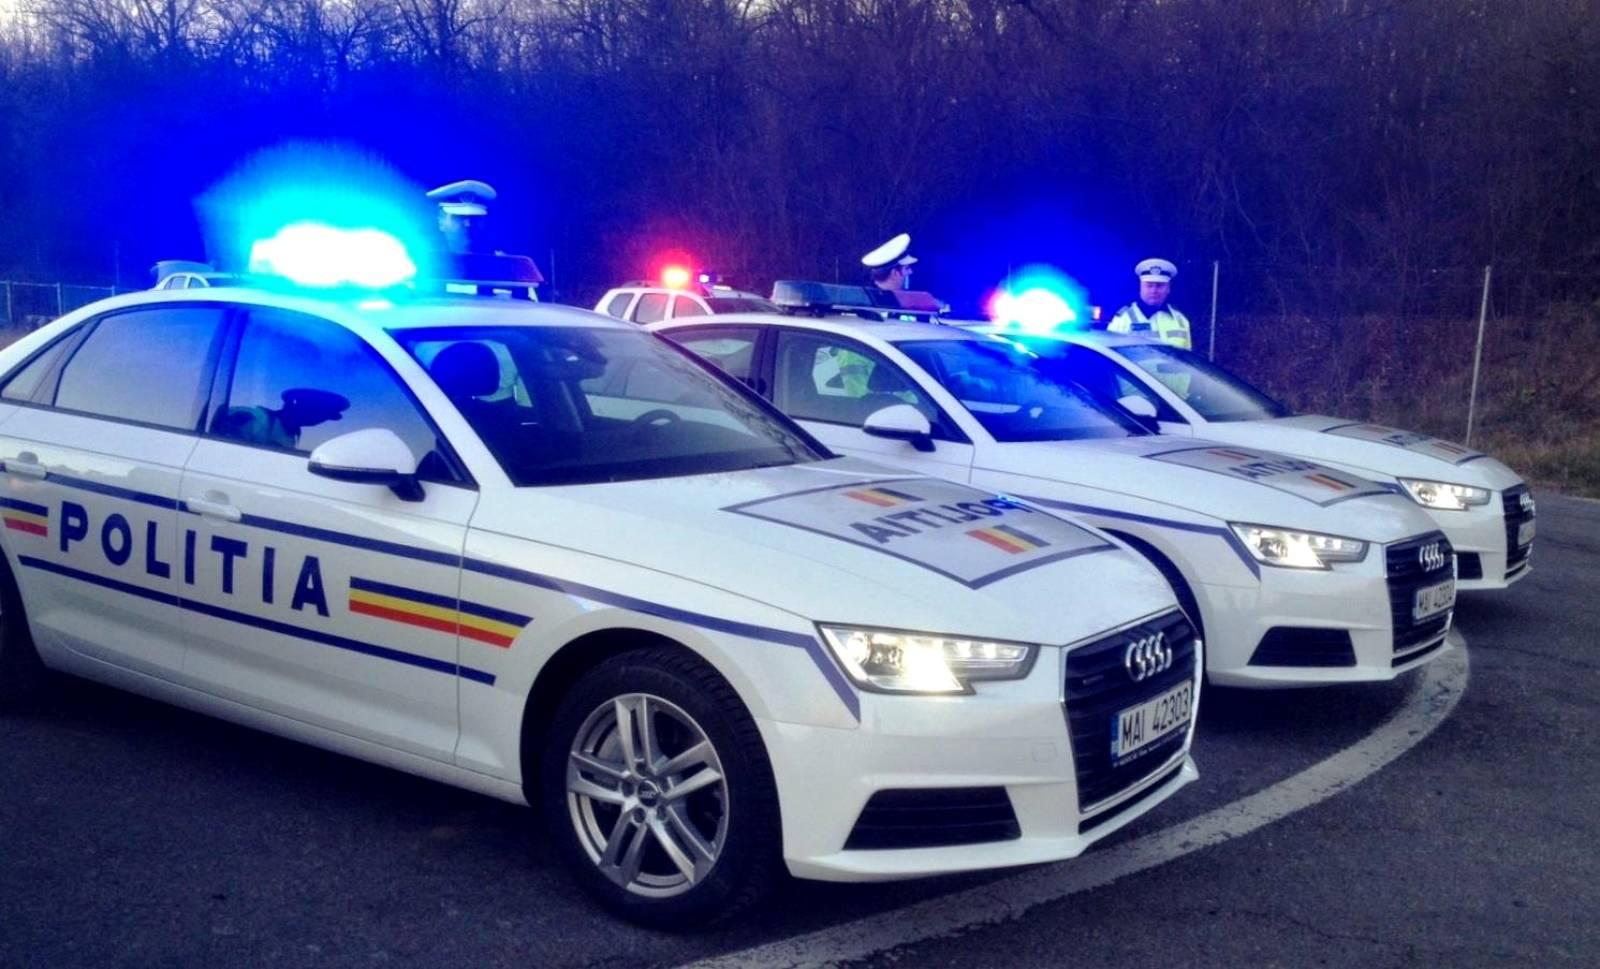 Politia Romana intervine forta nepurtare masca